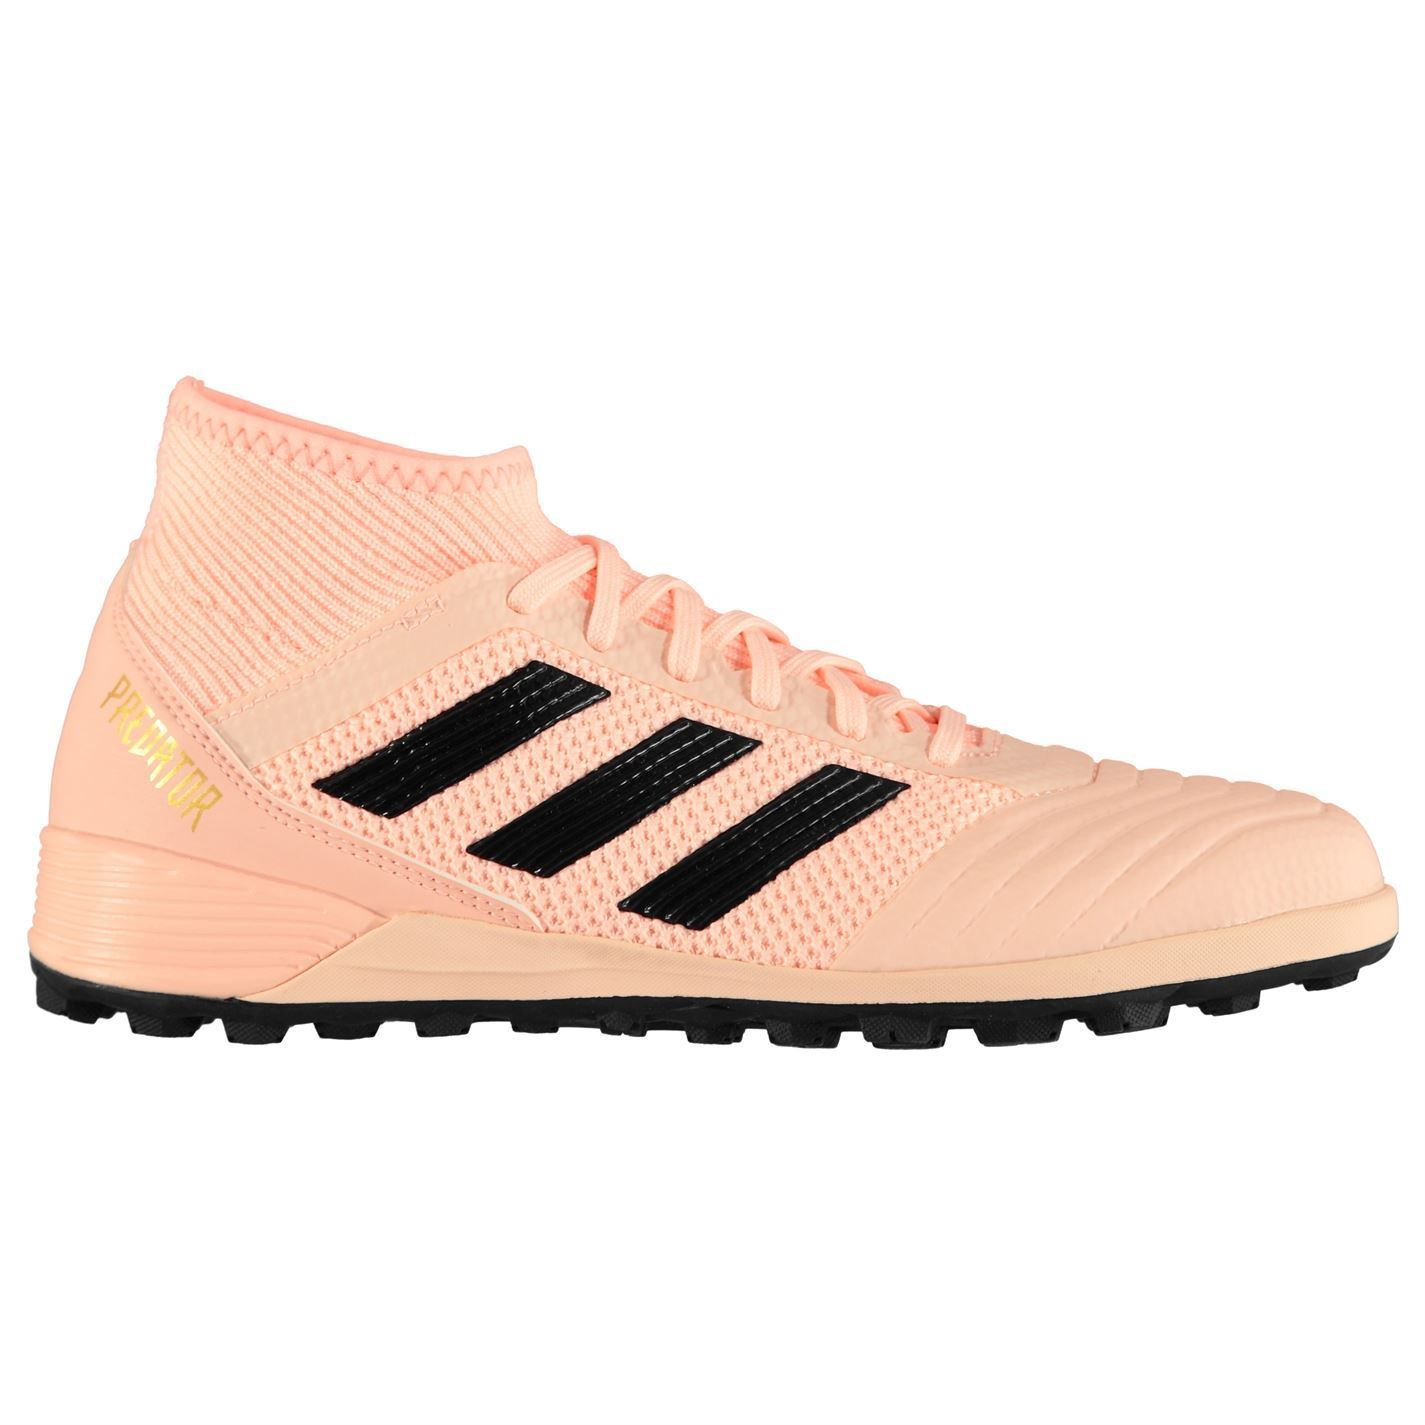 6420758fd ... adidas Predator Tango 18.3 Astro Turf Football Trainers Mens Soccer  Shoe Sneaker